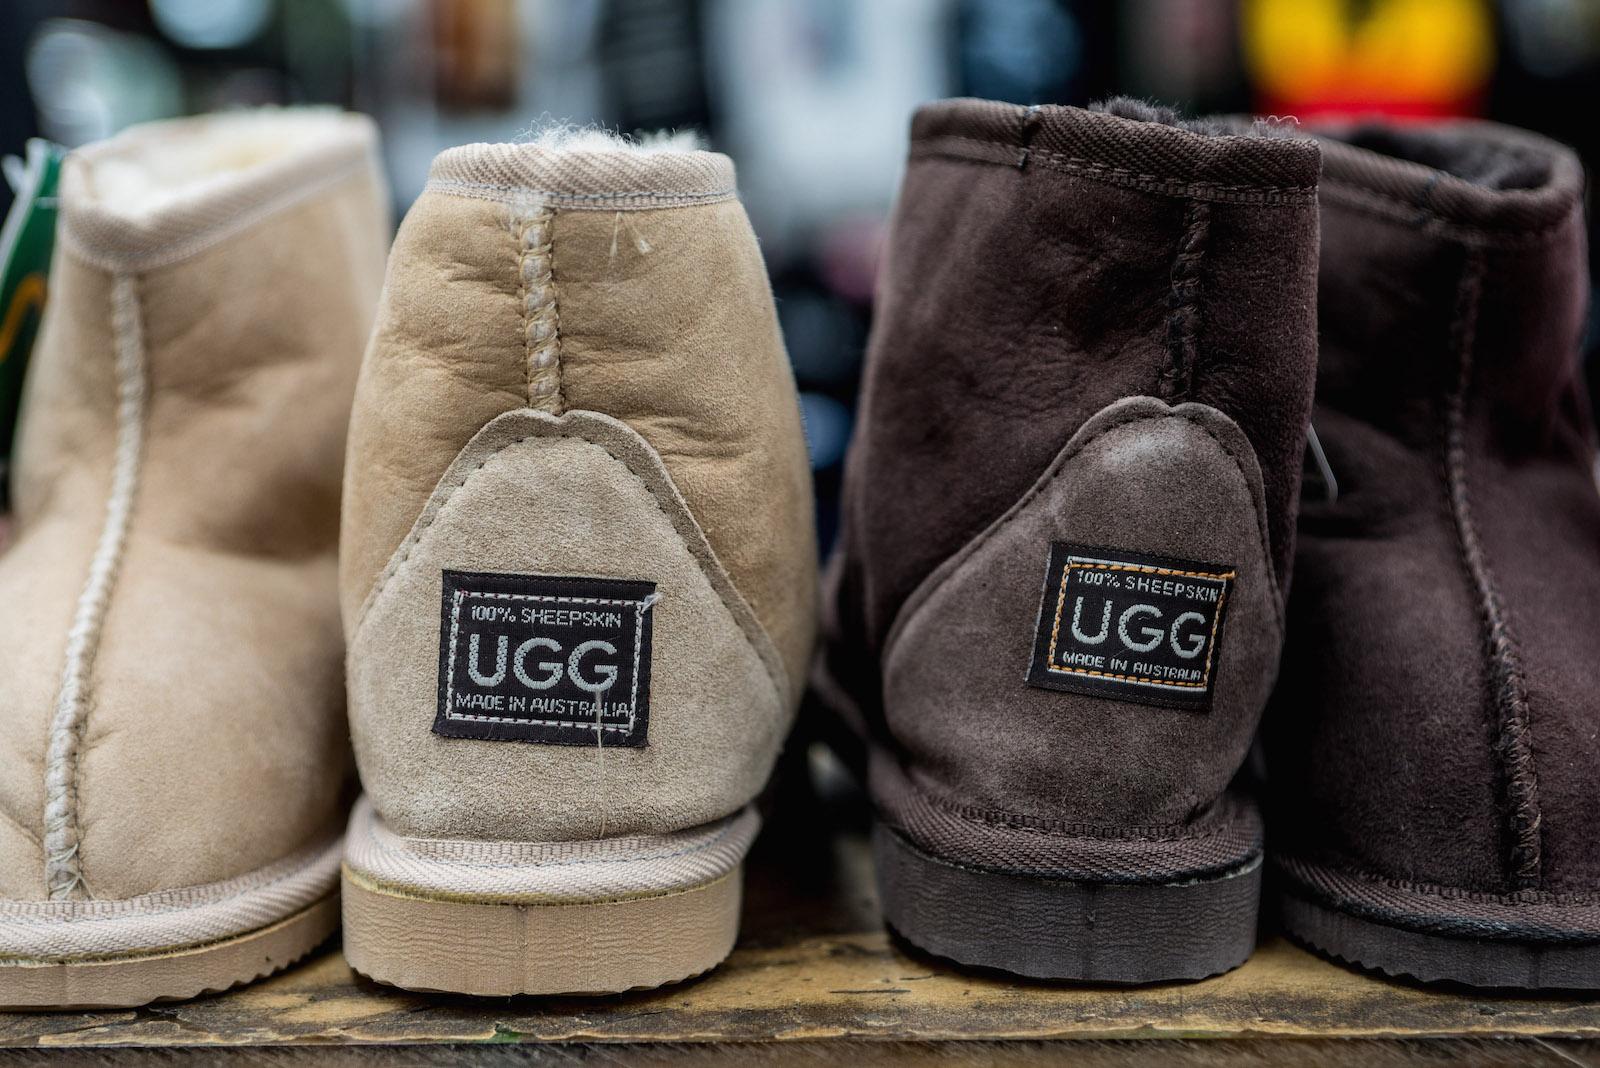 Market Caribbean Gardens Cut Engineer Best Safety Boots Iron Apple Soft Brown Ugg